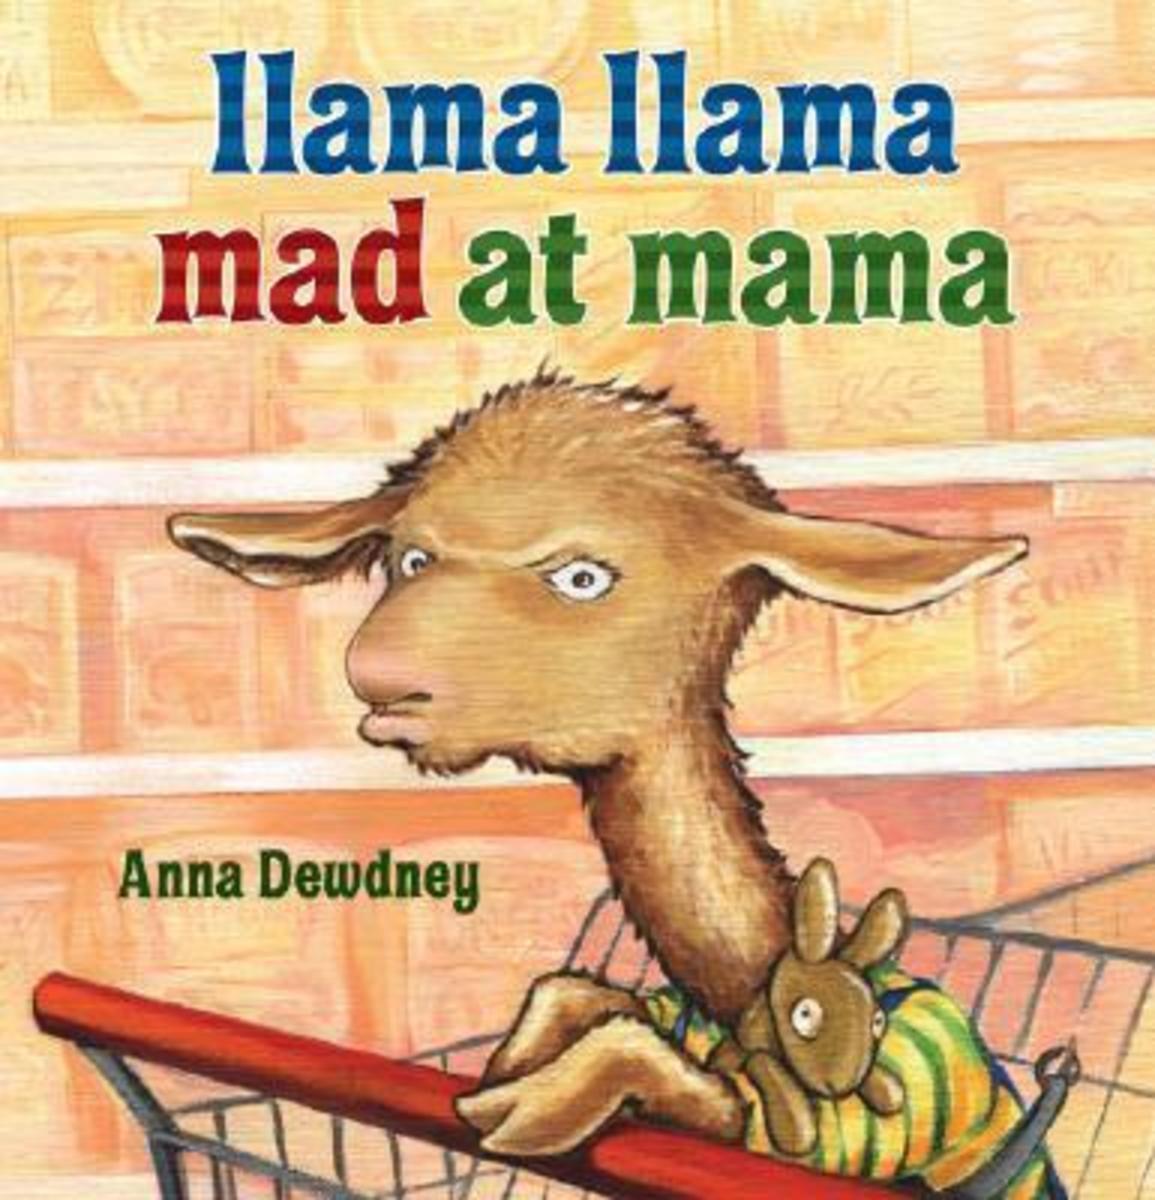 Llama Llama Mad at Mama by Anna Dewdney Children's Book Review